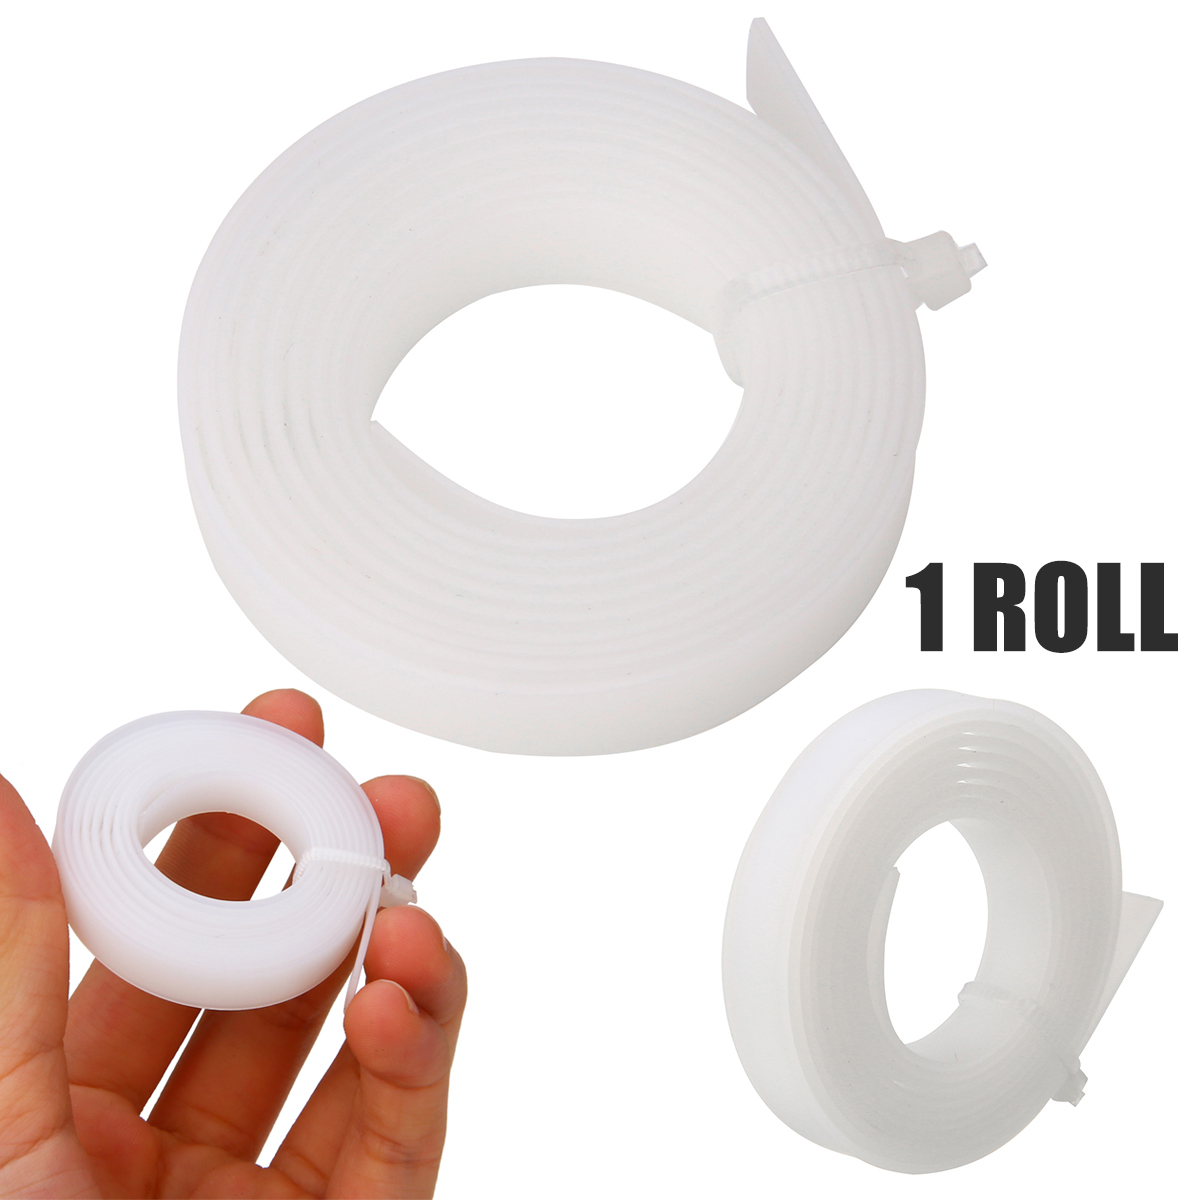 1 Roll Cutting Plotter Blade Strip White Protection Guard Vinyl Cutter Plotter Strip 100cmx8mm